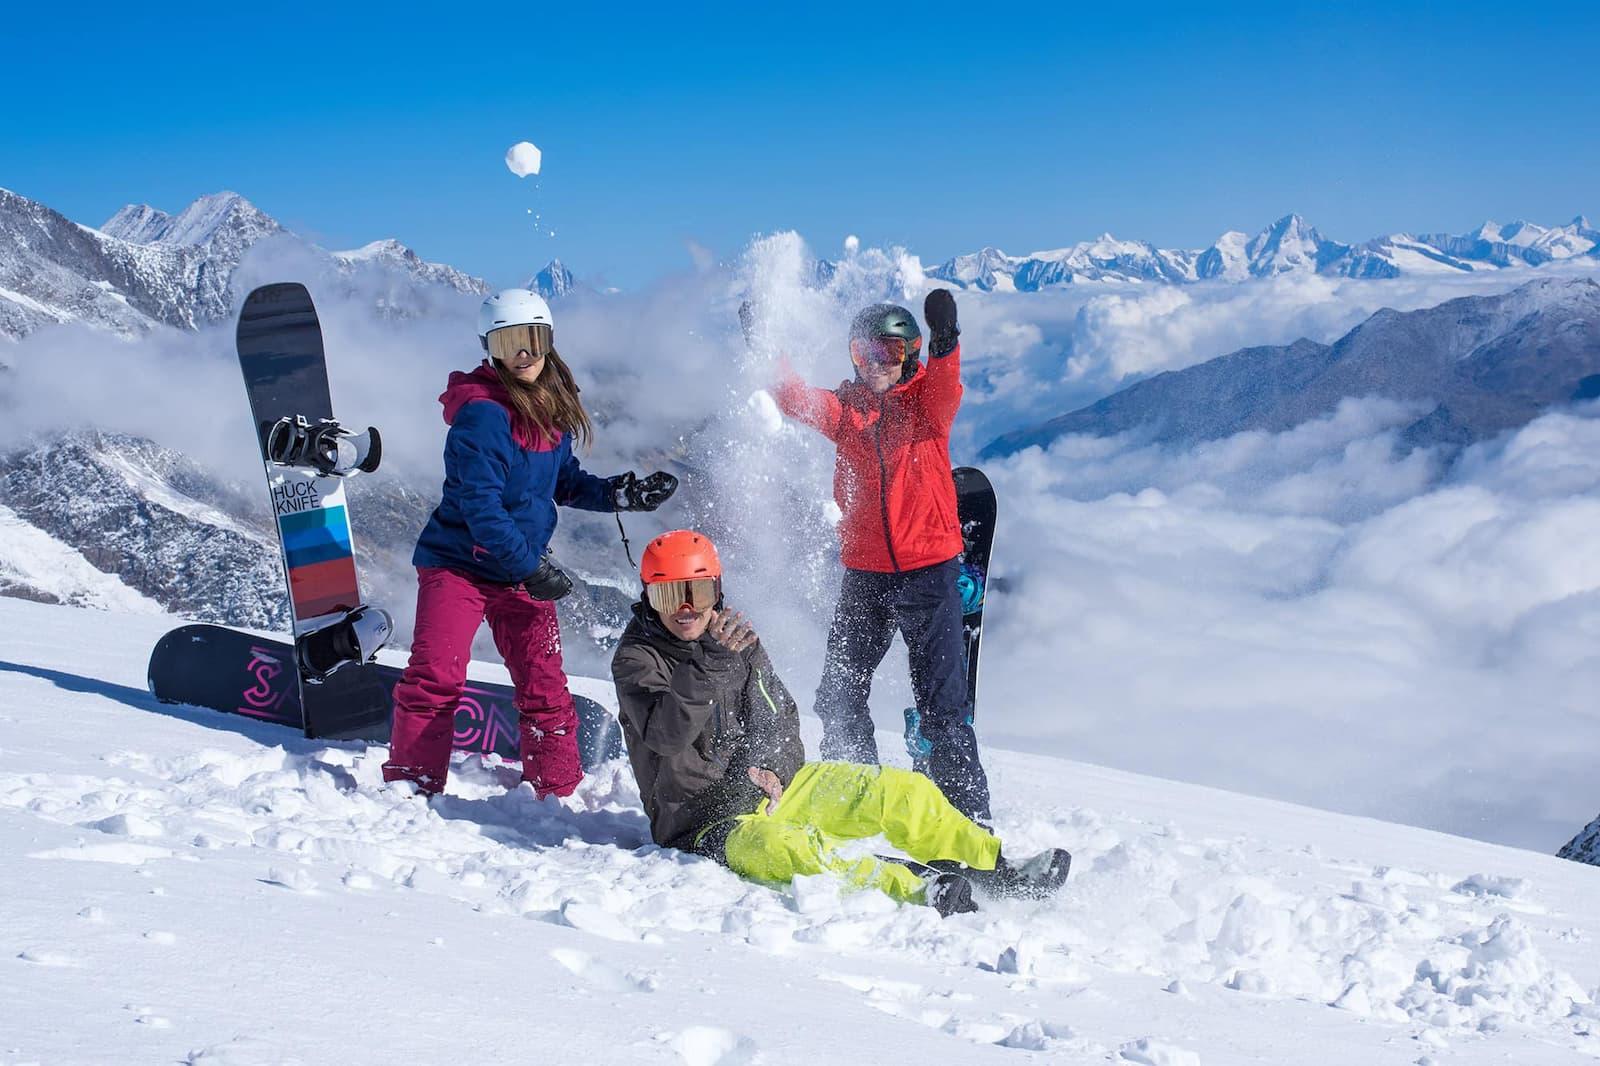 Sportpark Aare-Rhein Snowboard Schneeball